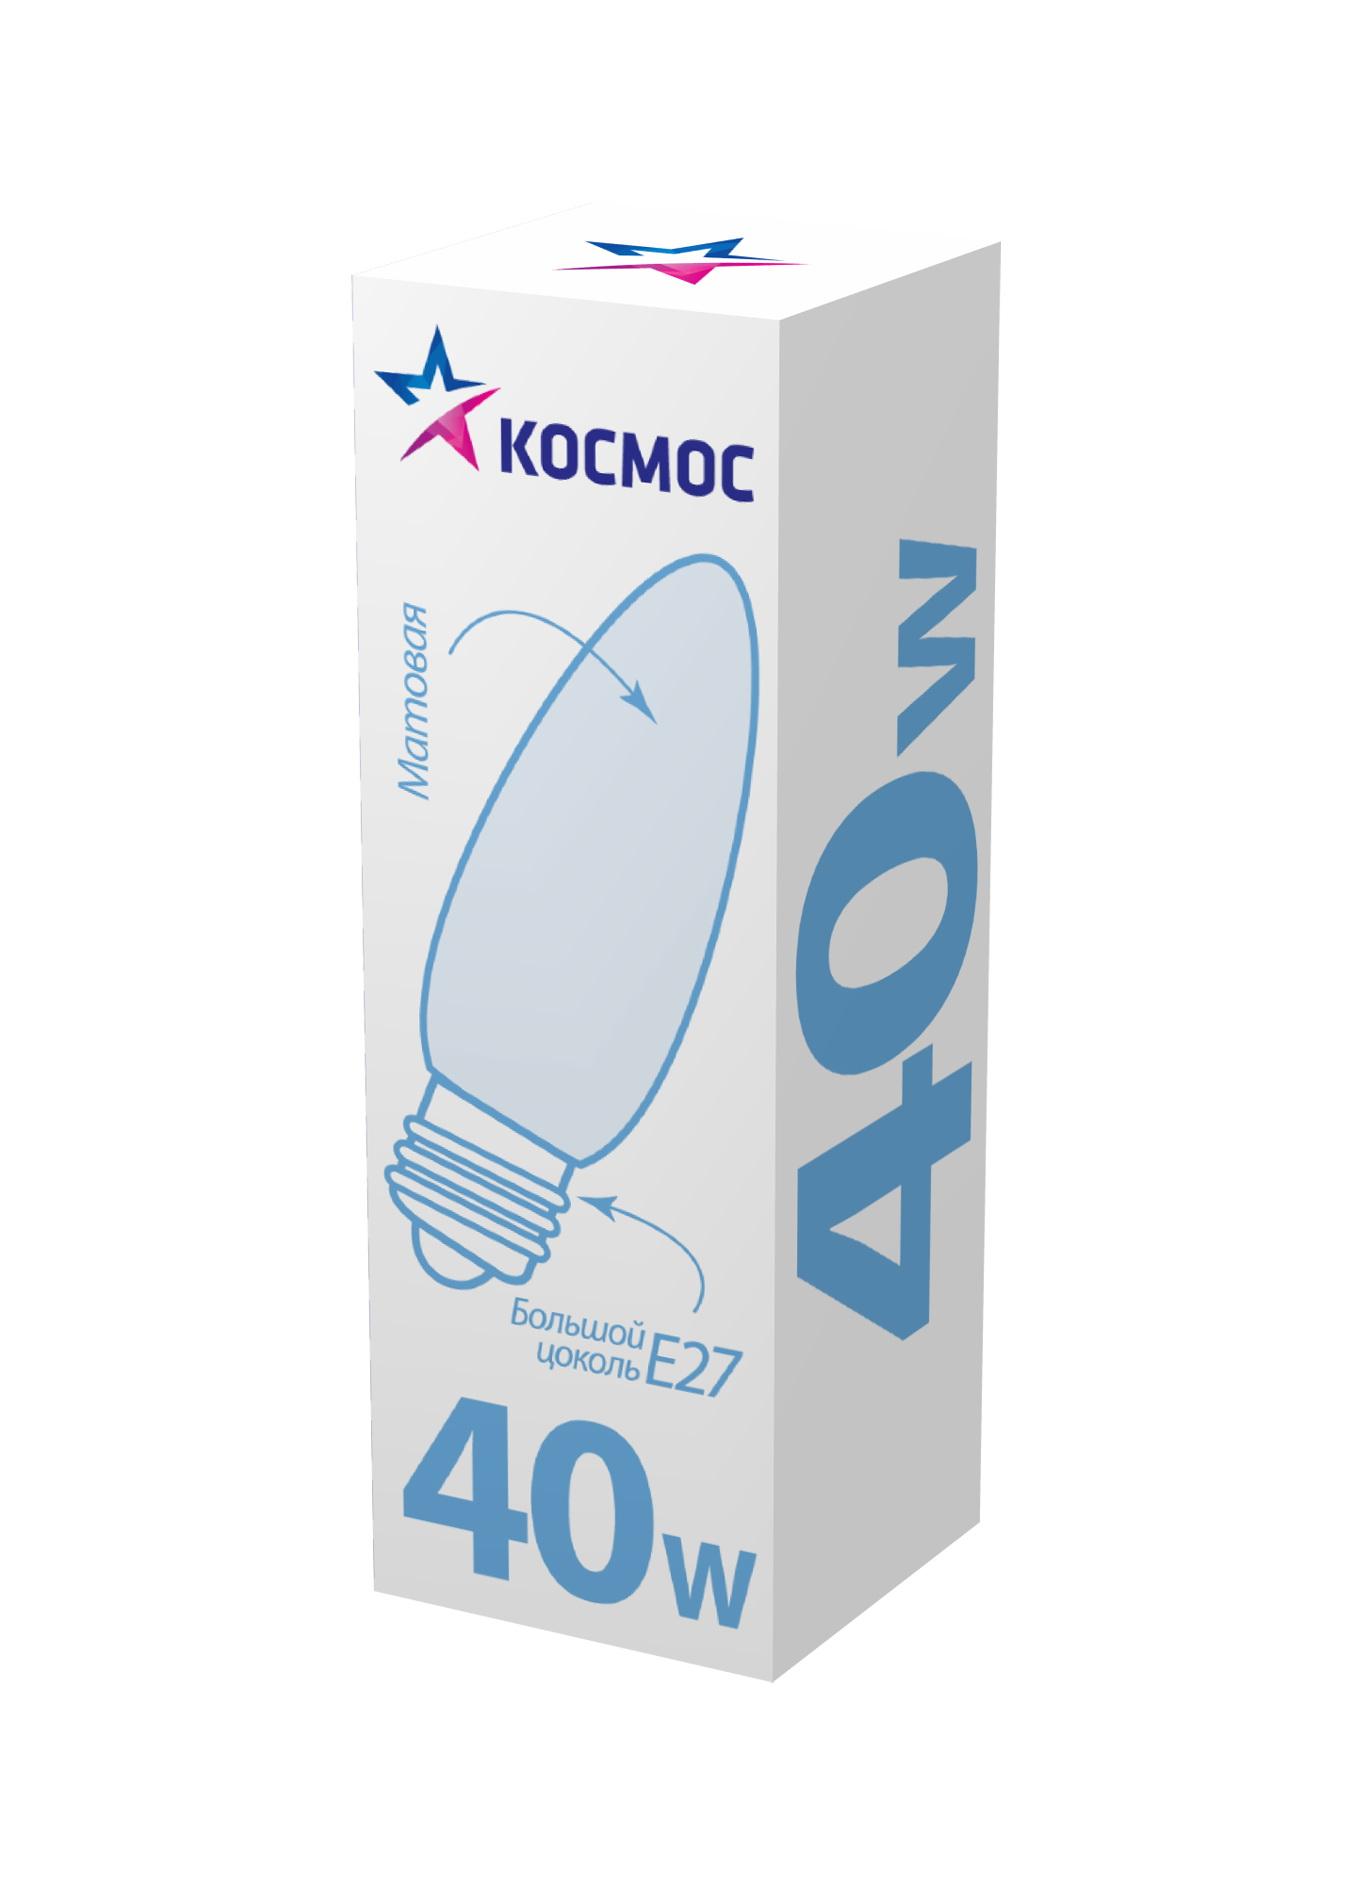 Лампа накаливания КОСМОСЛампы<br>Тип лампы: накаливания,<br>Форма лампы: свеча,<br>Цвет колбы: матовая,<br>Тип цоколя: Е27,<br>Напряжение: 220,<br>Мощность: 40,<br>Цвет свечения: теплый<br>